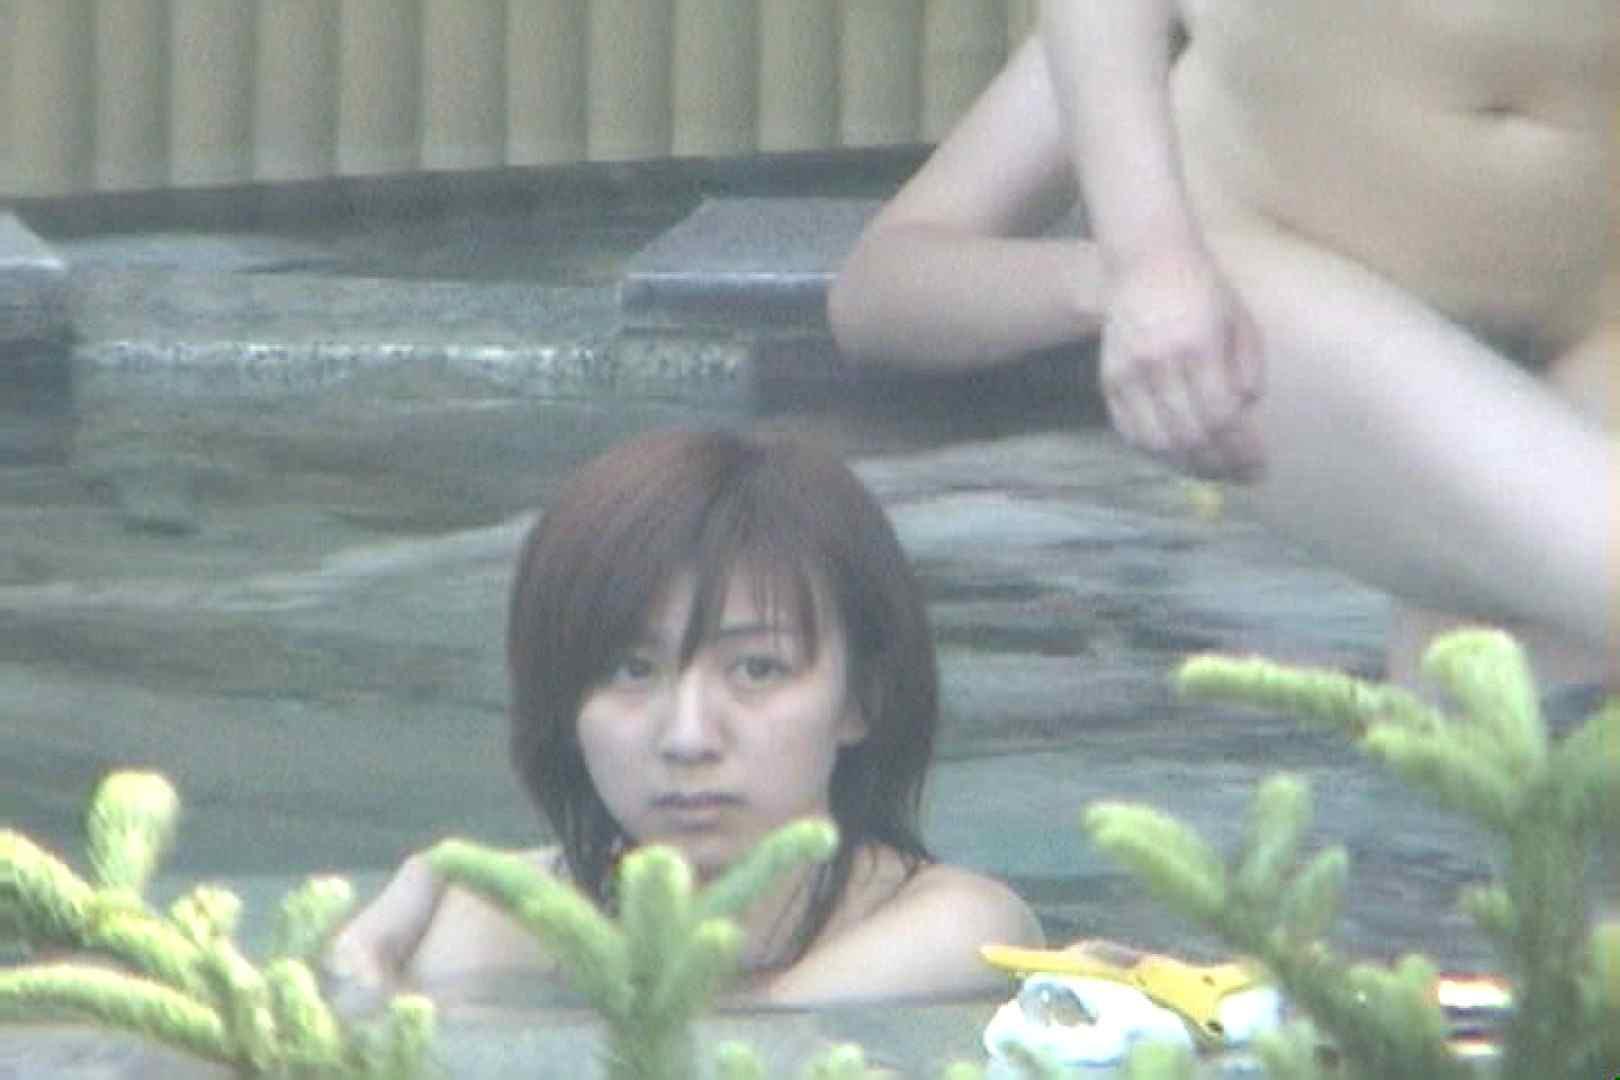 Aquaな露天風呂Vol.77【VIP限定】 露天   盗撮特集  98画像 81